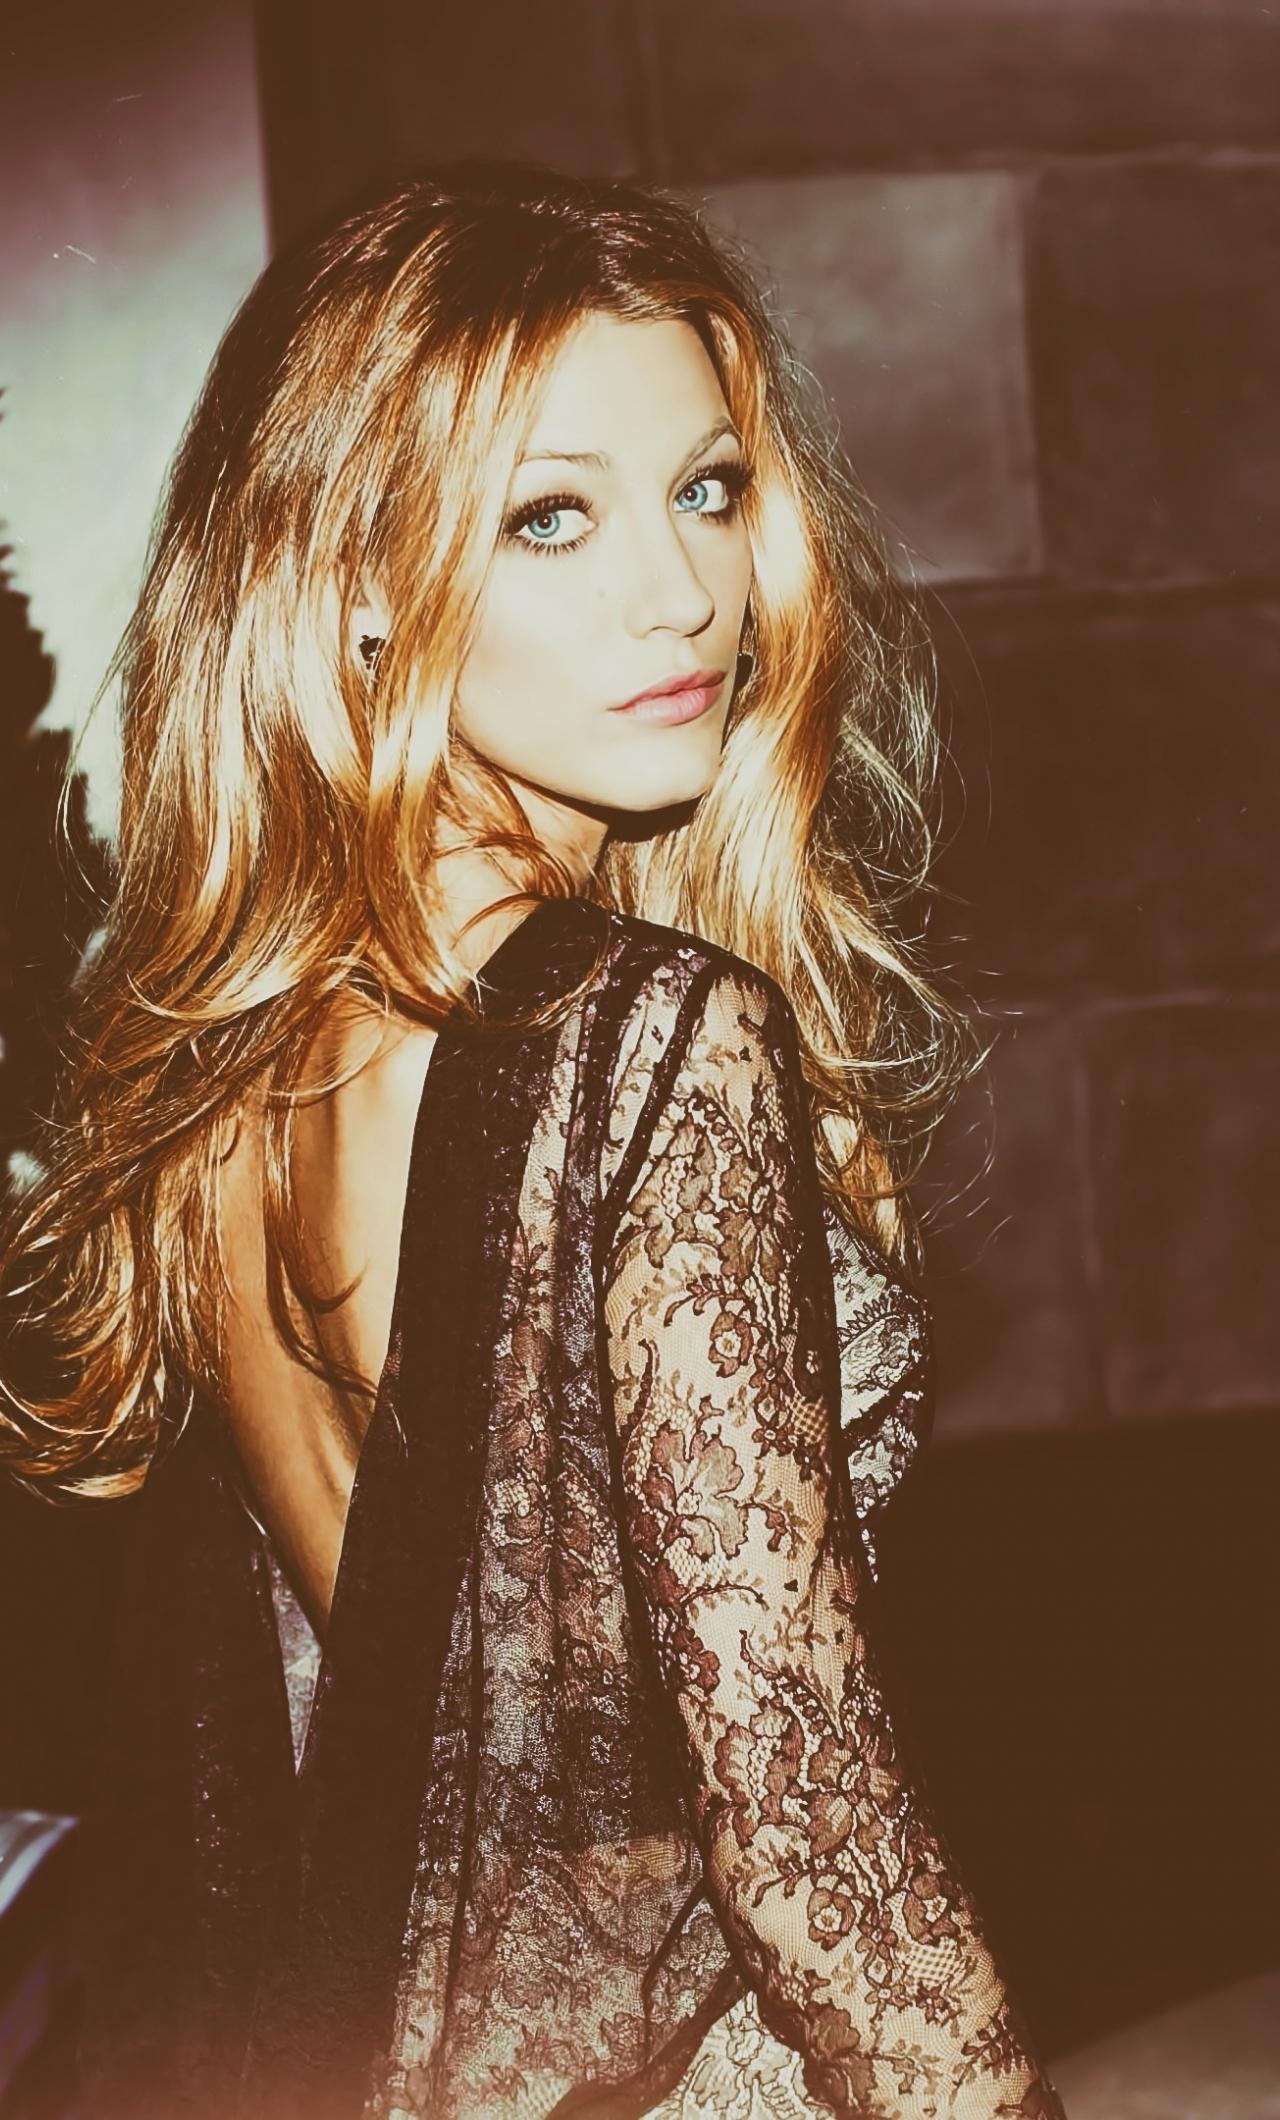 Download 1280x2120 Wallpaper Black Dress Blake Lively Actress Iphone 6 Plus 1280x2120 Hd Image Background 6922